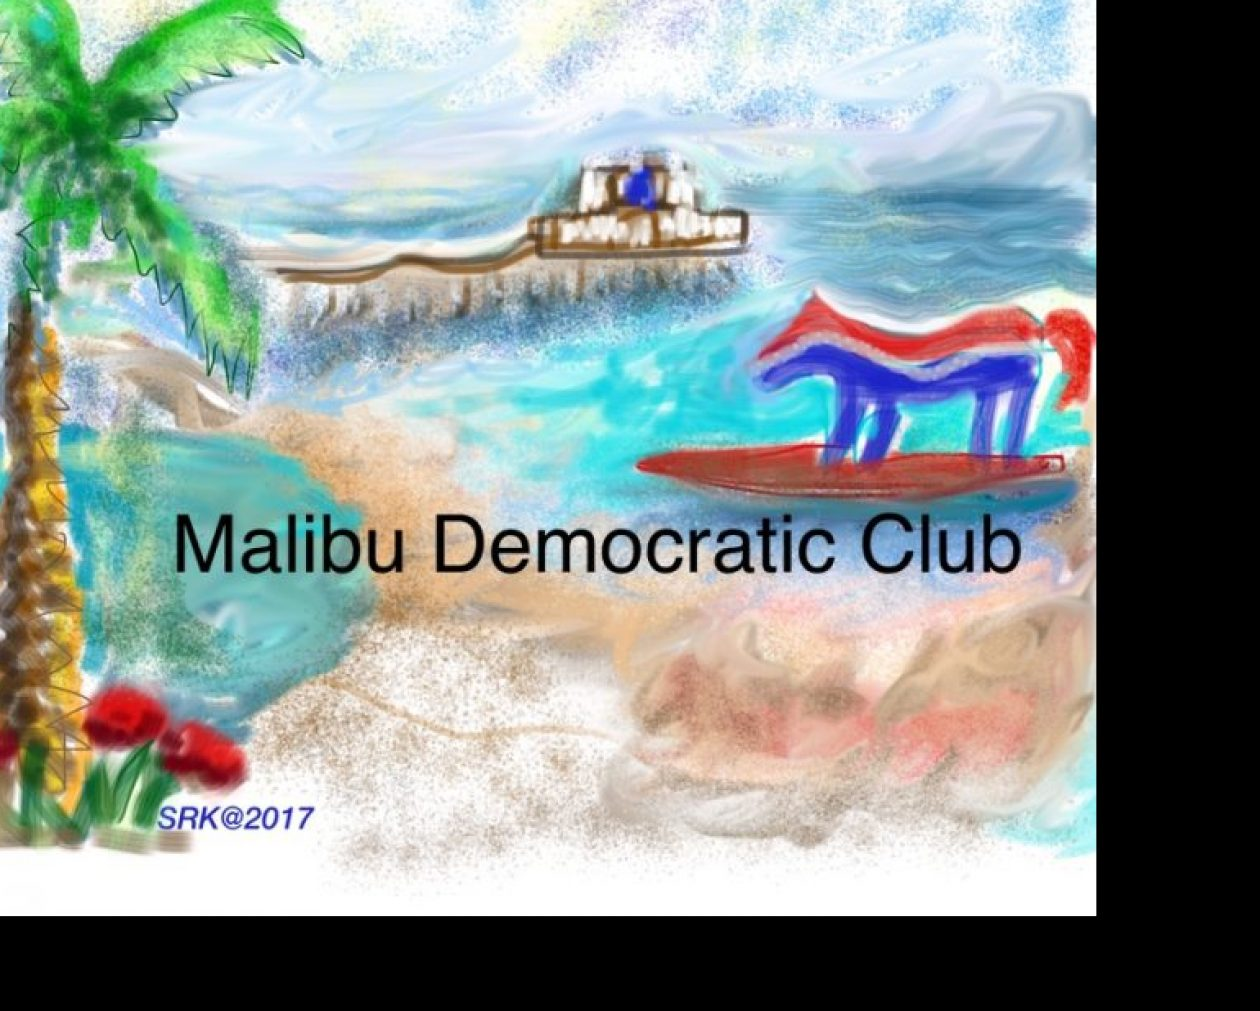 Malibu Democratic Club